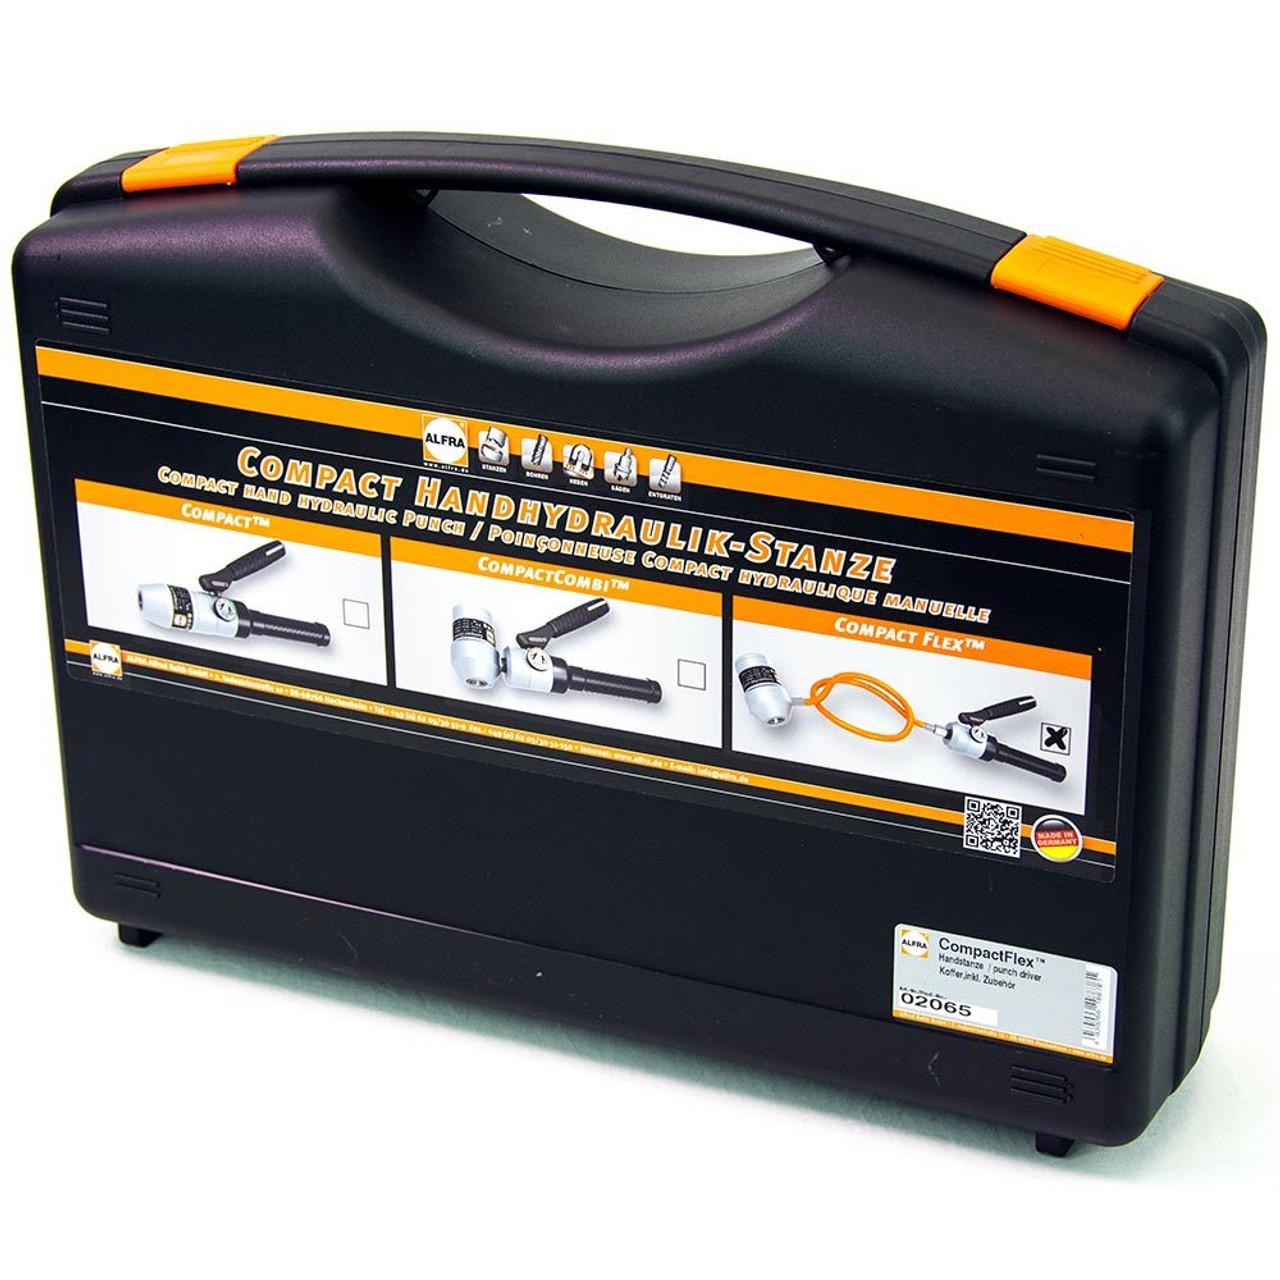 Alfra CompactFlex Manual Hydraulic Punching Tool Kit